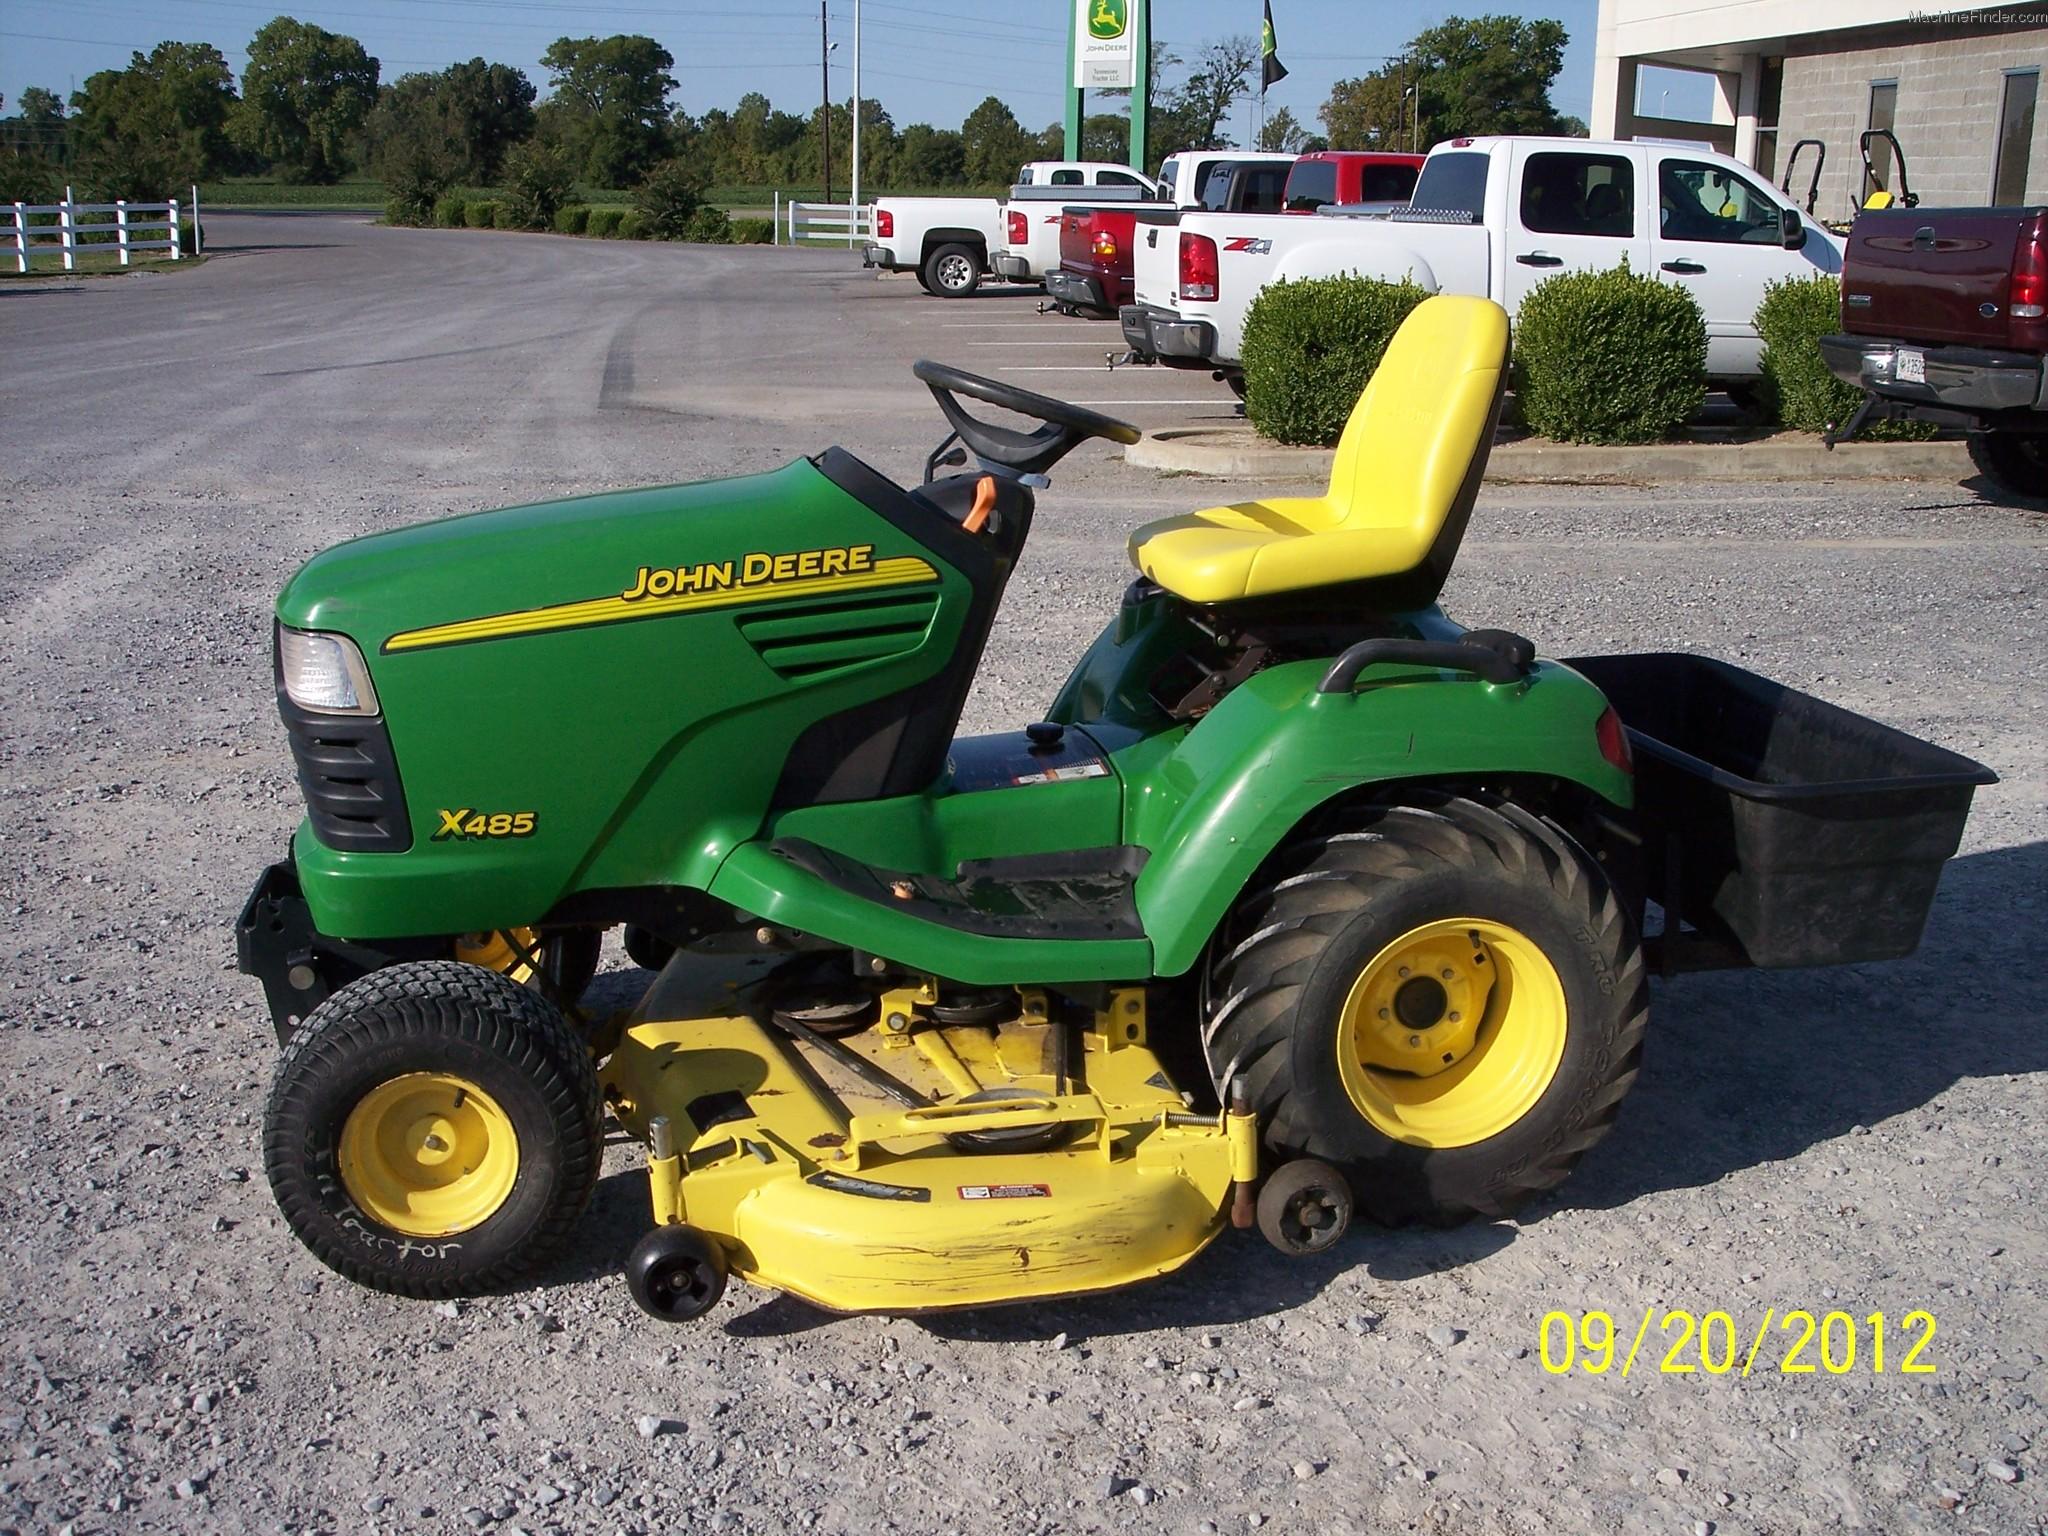 2003 John Deere X485 Lawn & Garden and Commercial Mowing ...